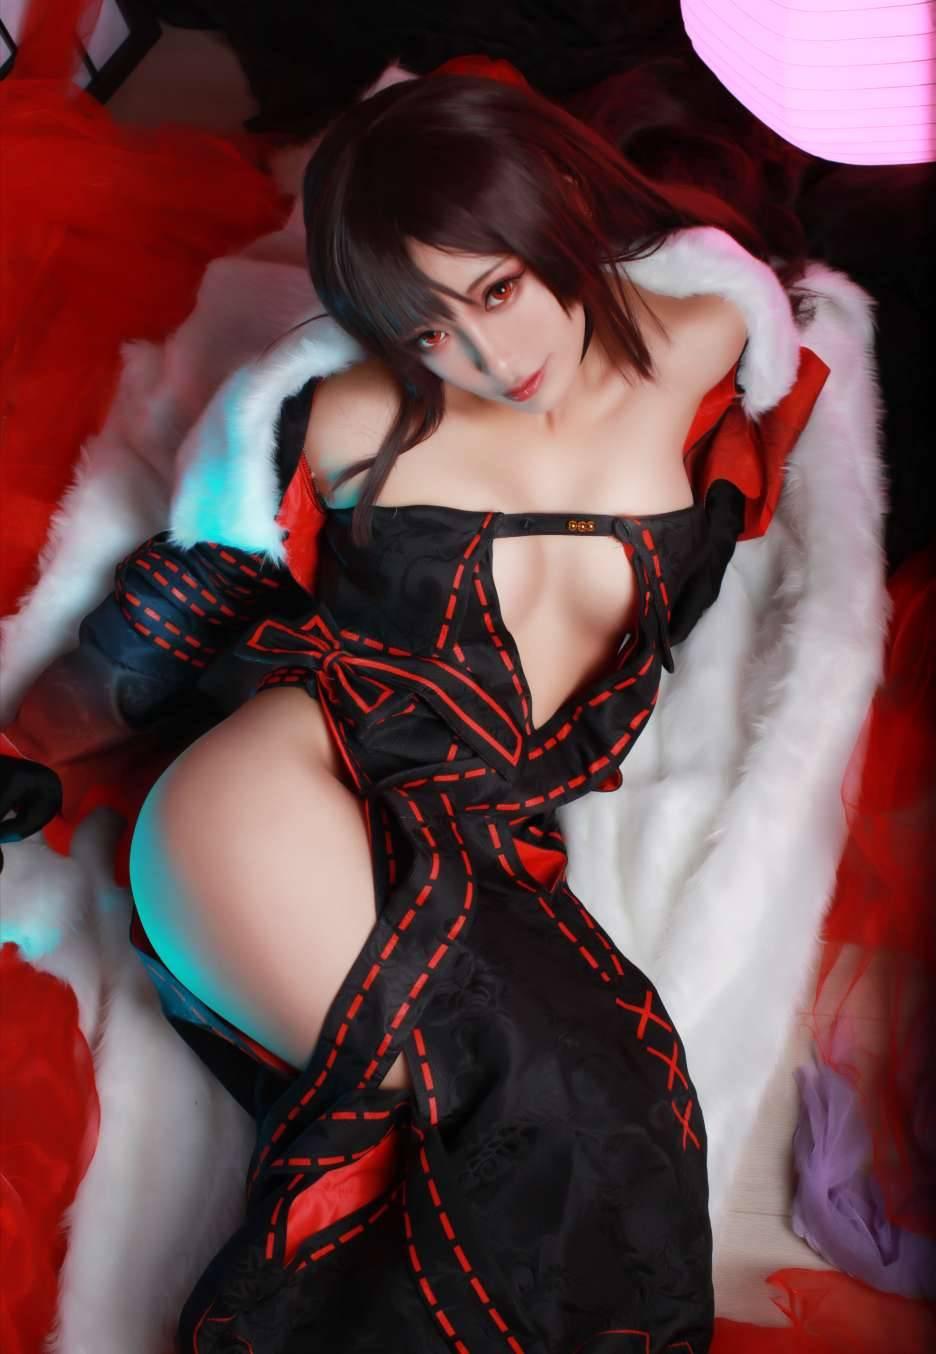 《Fate/GrandOrder》虞美人Cosplay【CN:洛璃LoLiSAMA】 (9P)-第1张